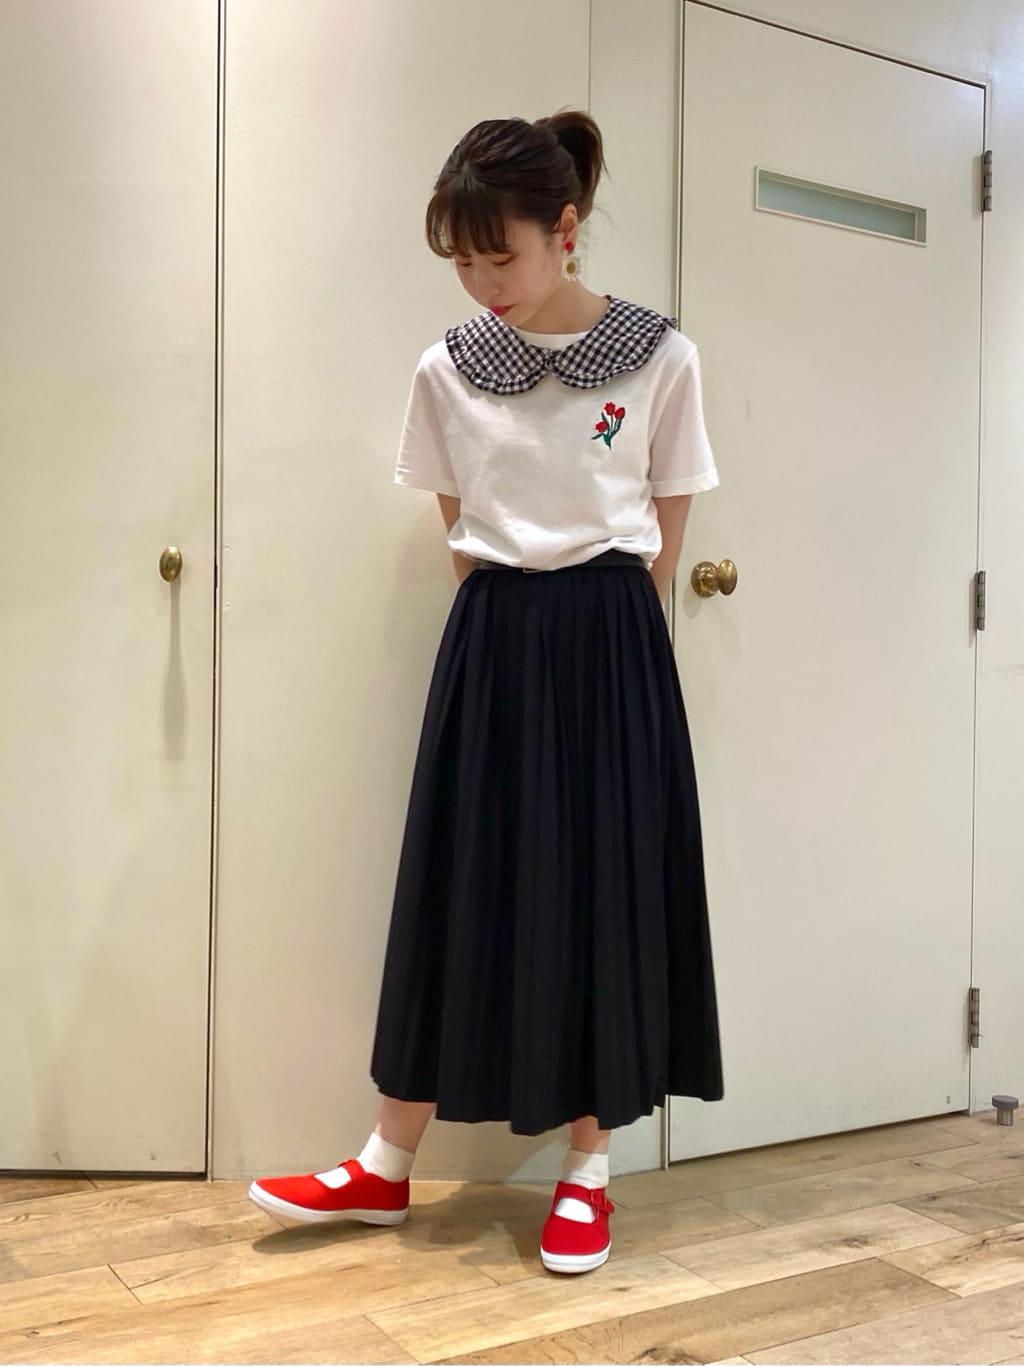 bulle de savon 新宿ミロード 身長:157cm 2021.07.06